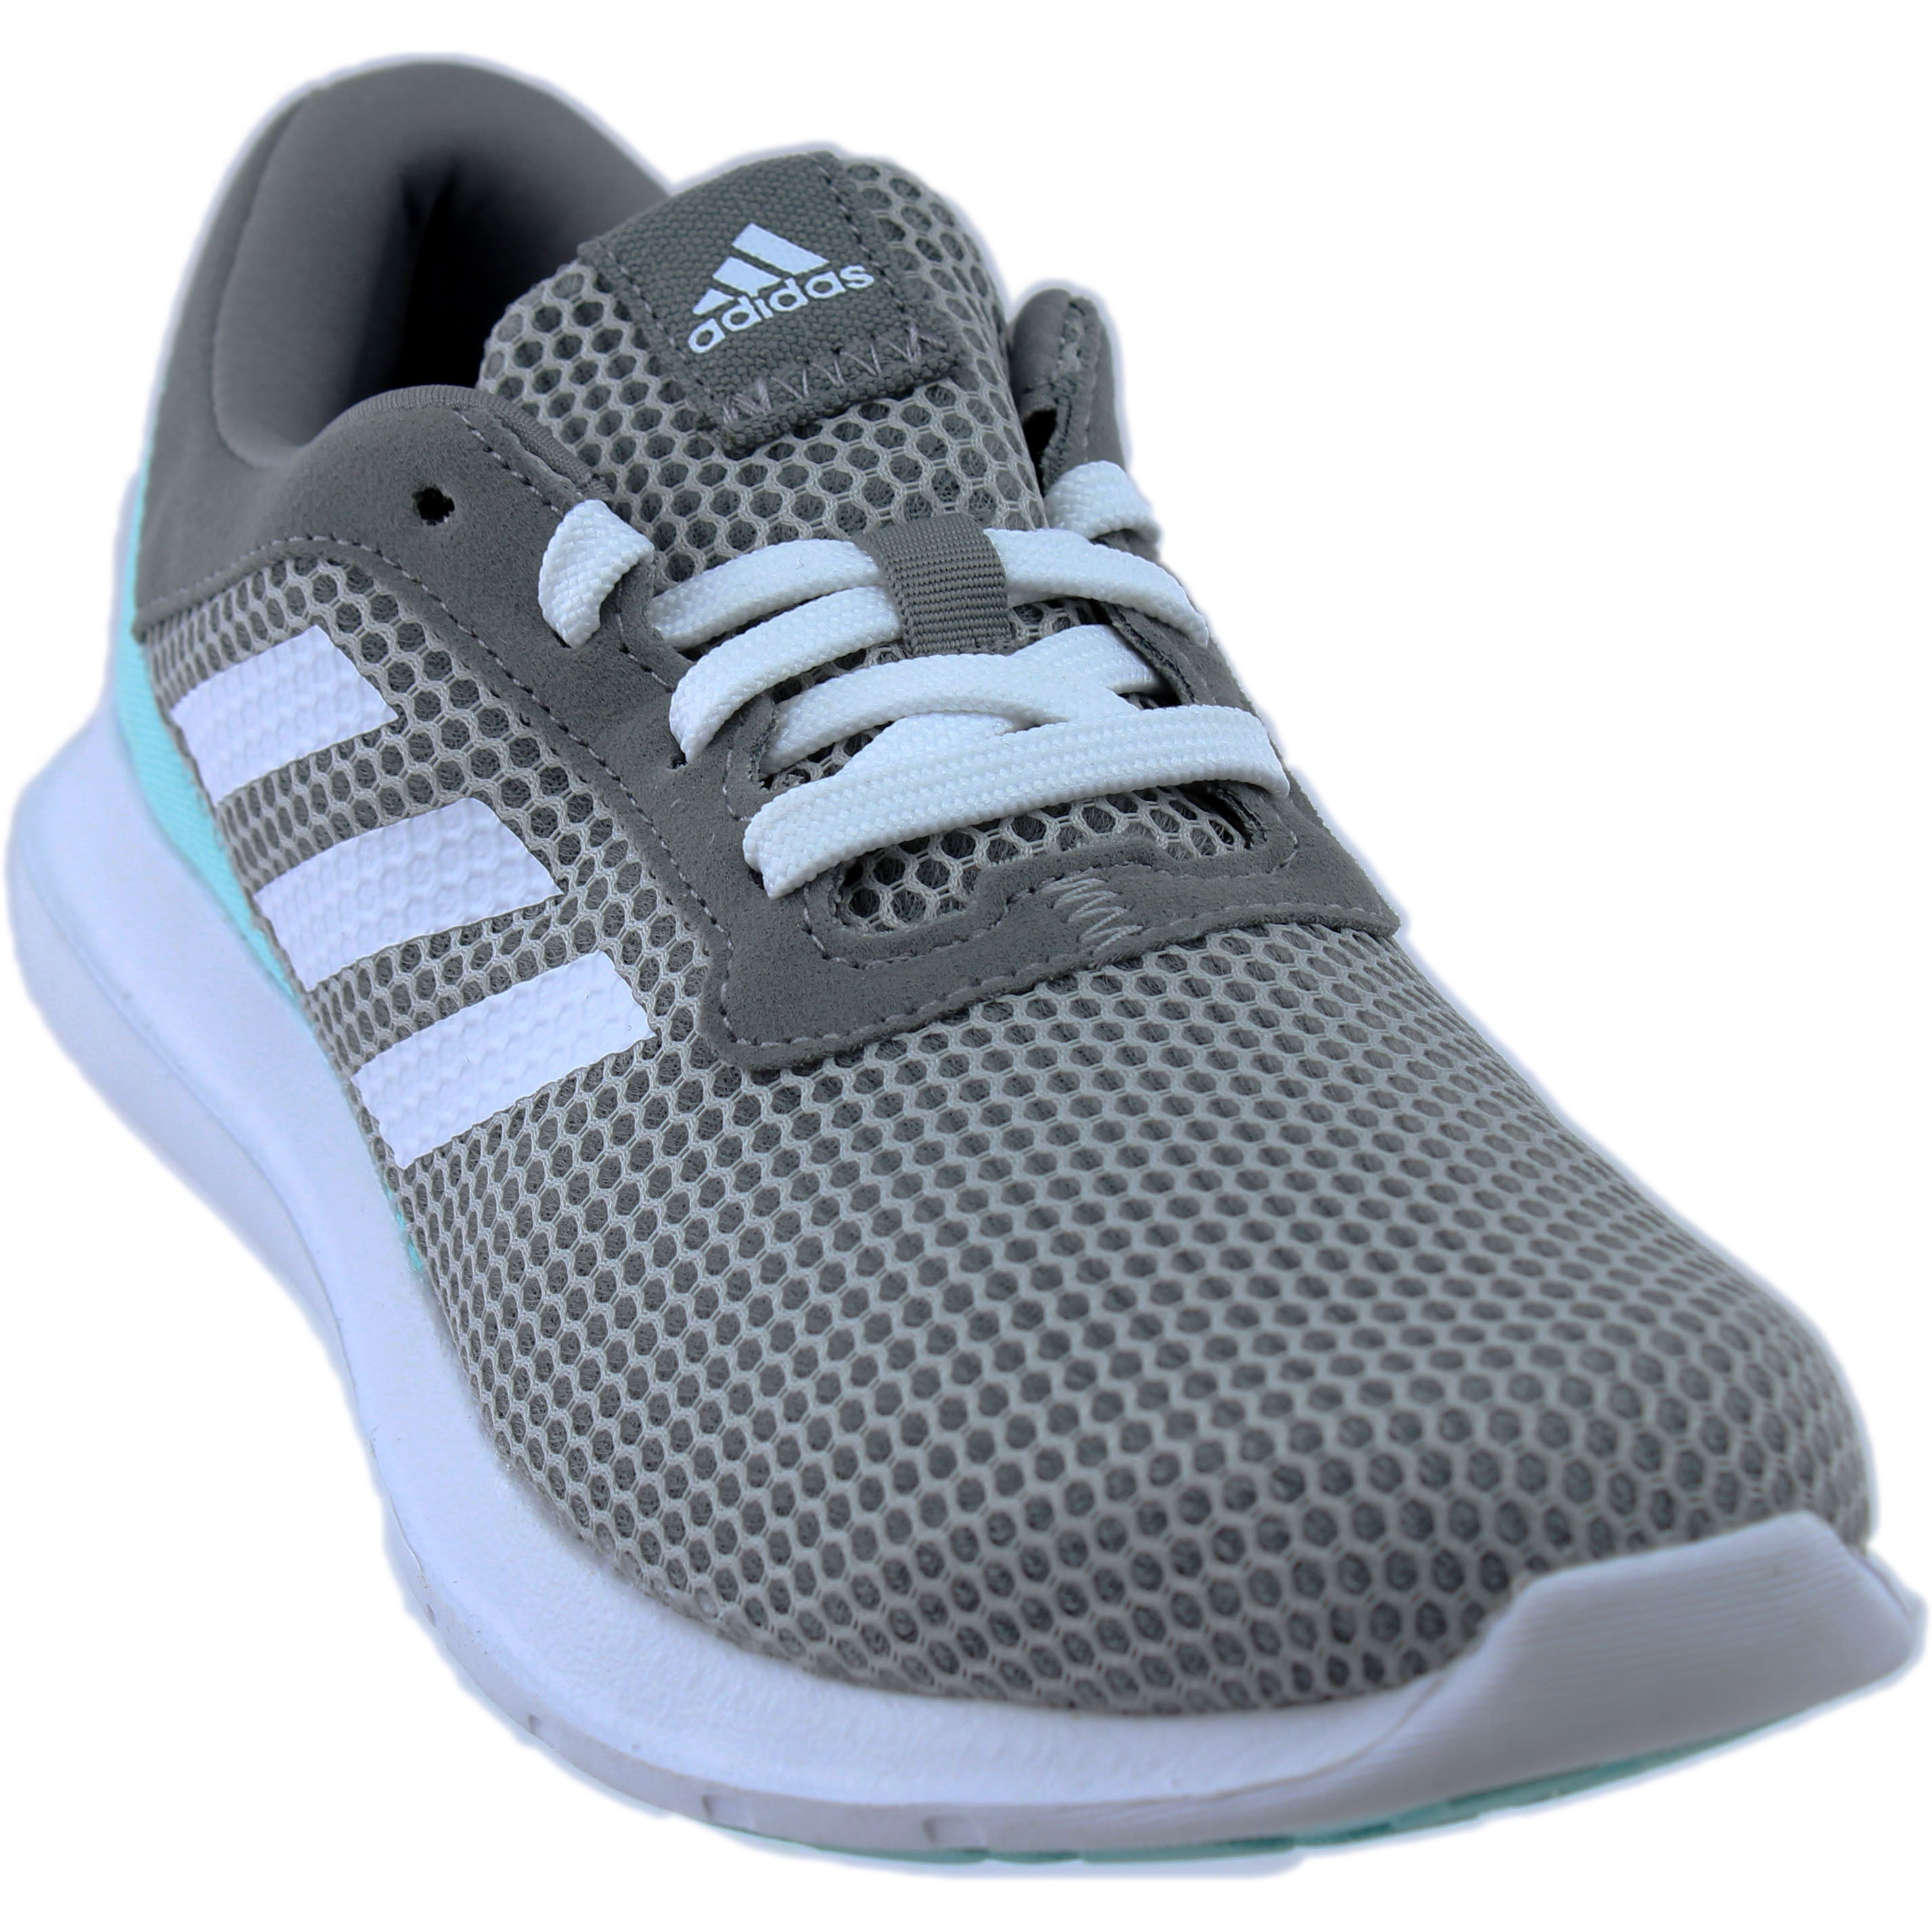 51d6e559630 adidas Element Refresh 3 Running Shoes Grey- Womens- Size 9.5 B